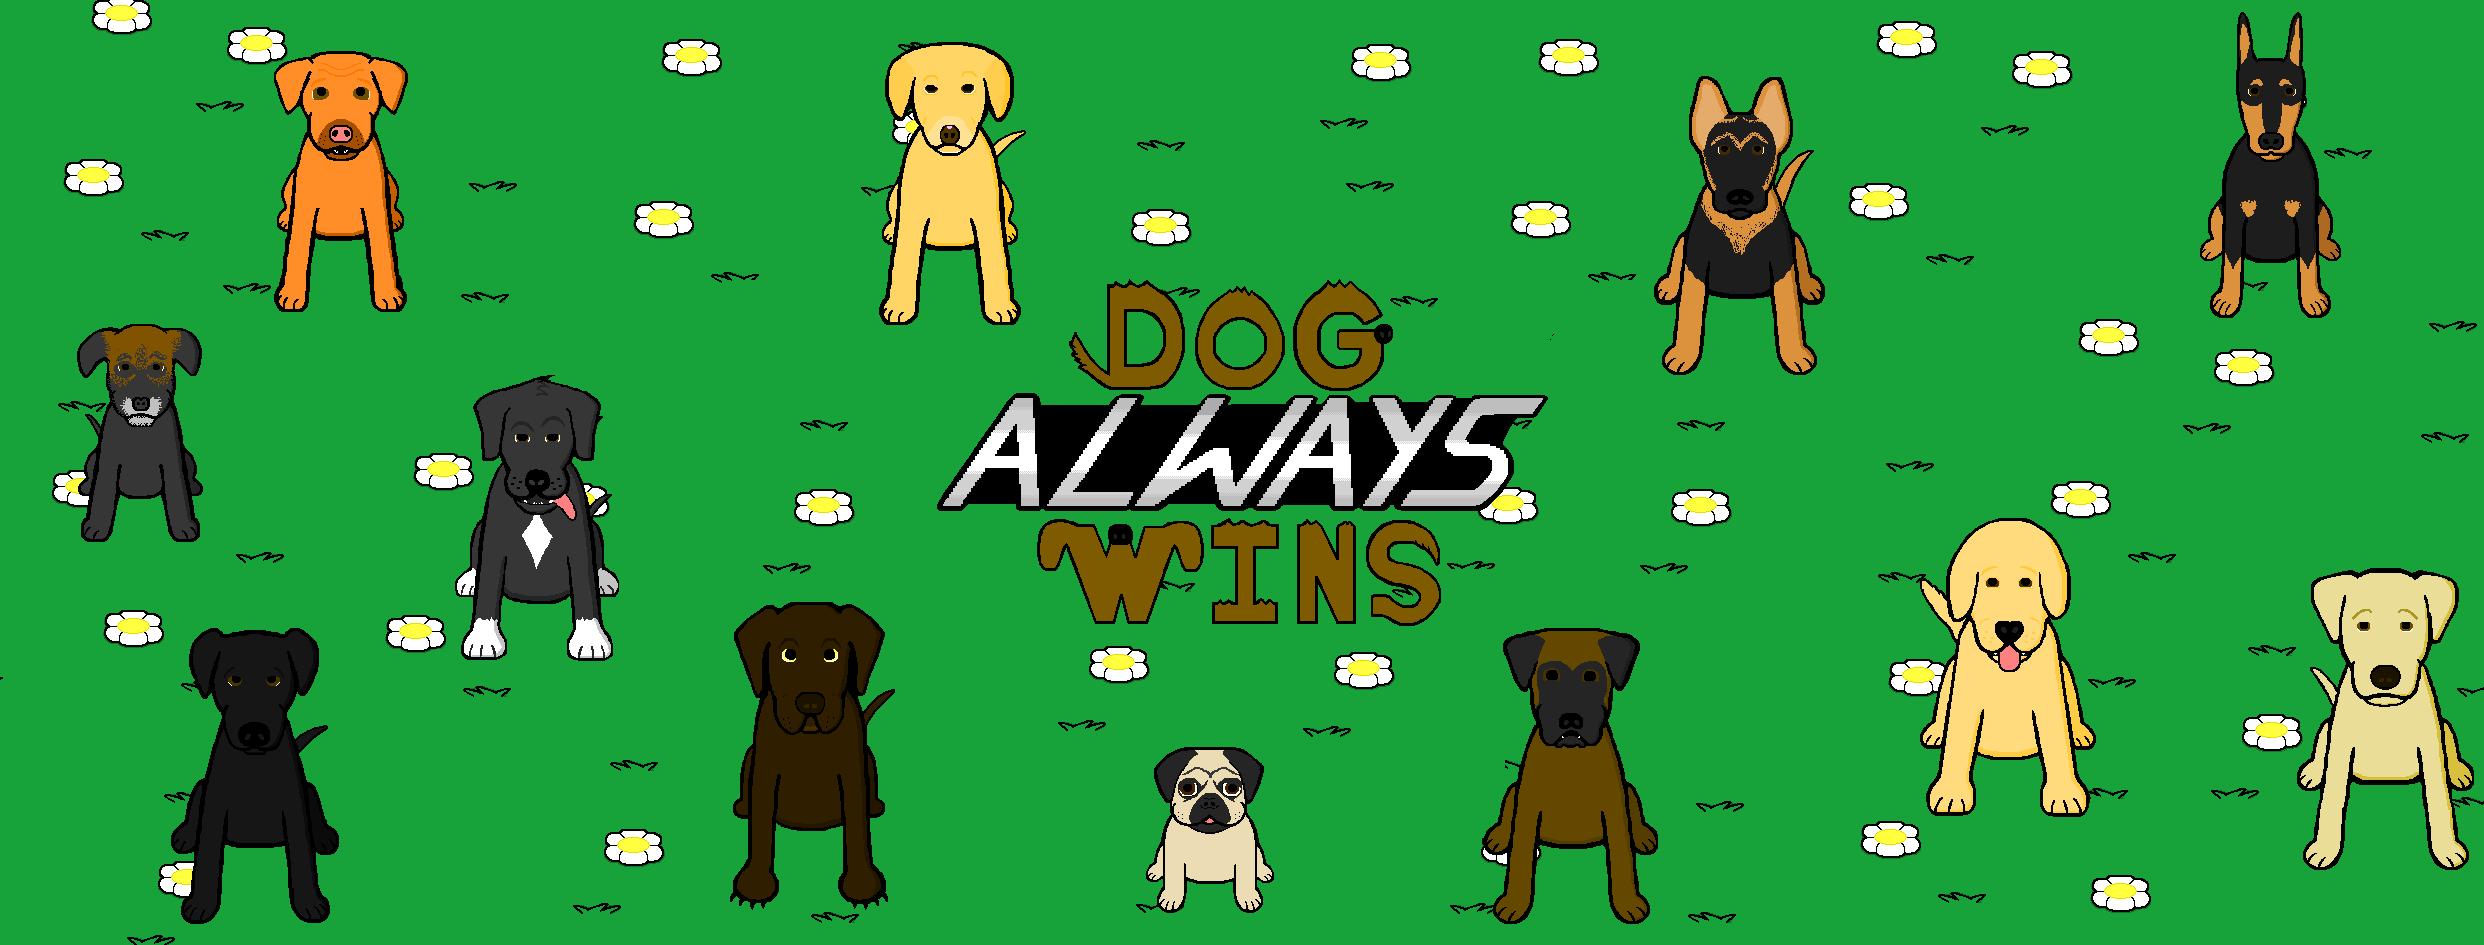 Dog Always Wins